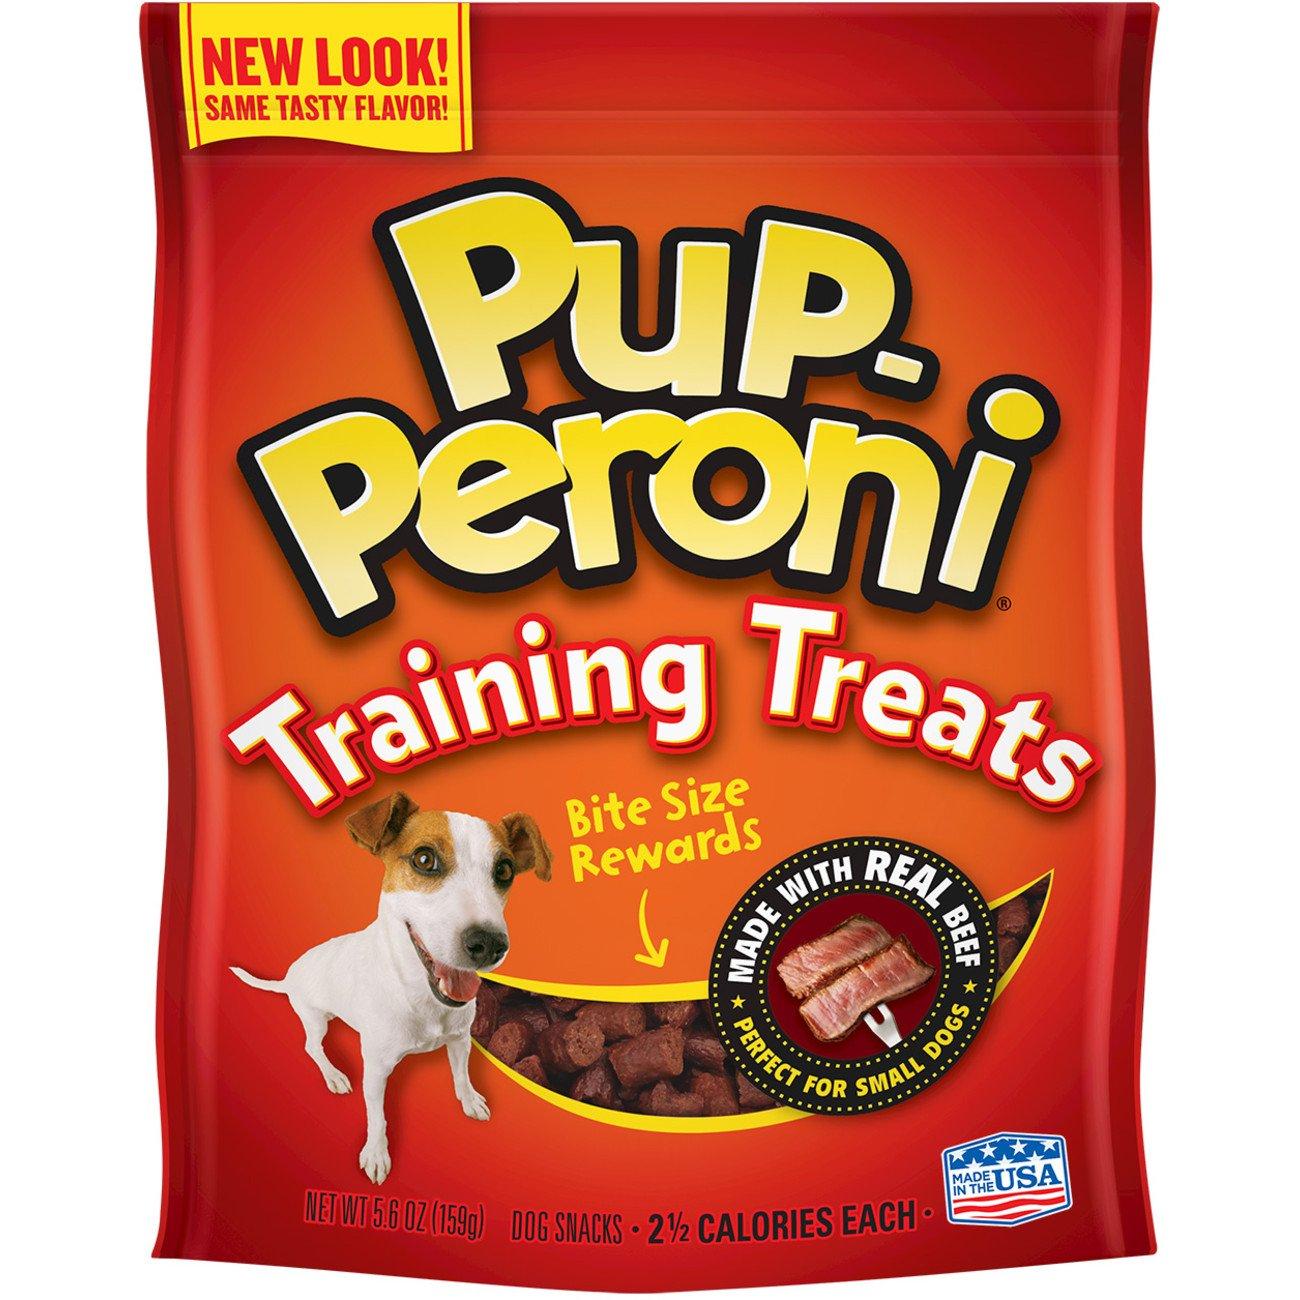 Pup-Peroni Training Treats, 5.6Oz